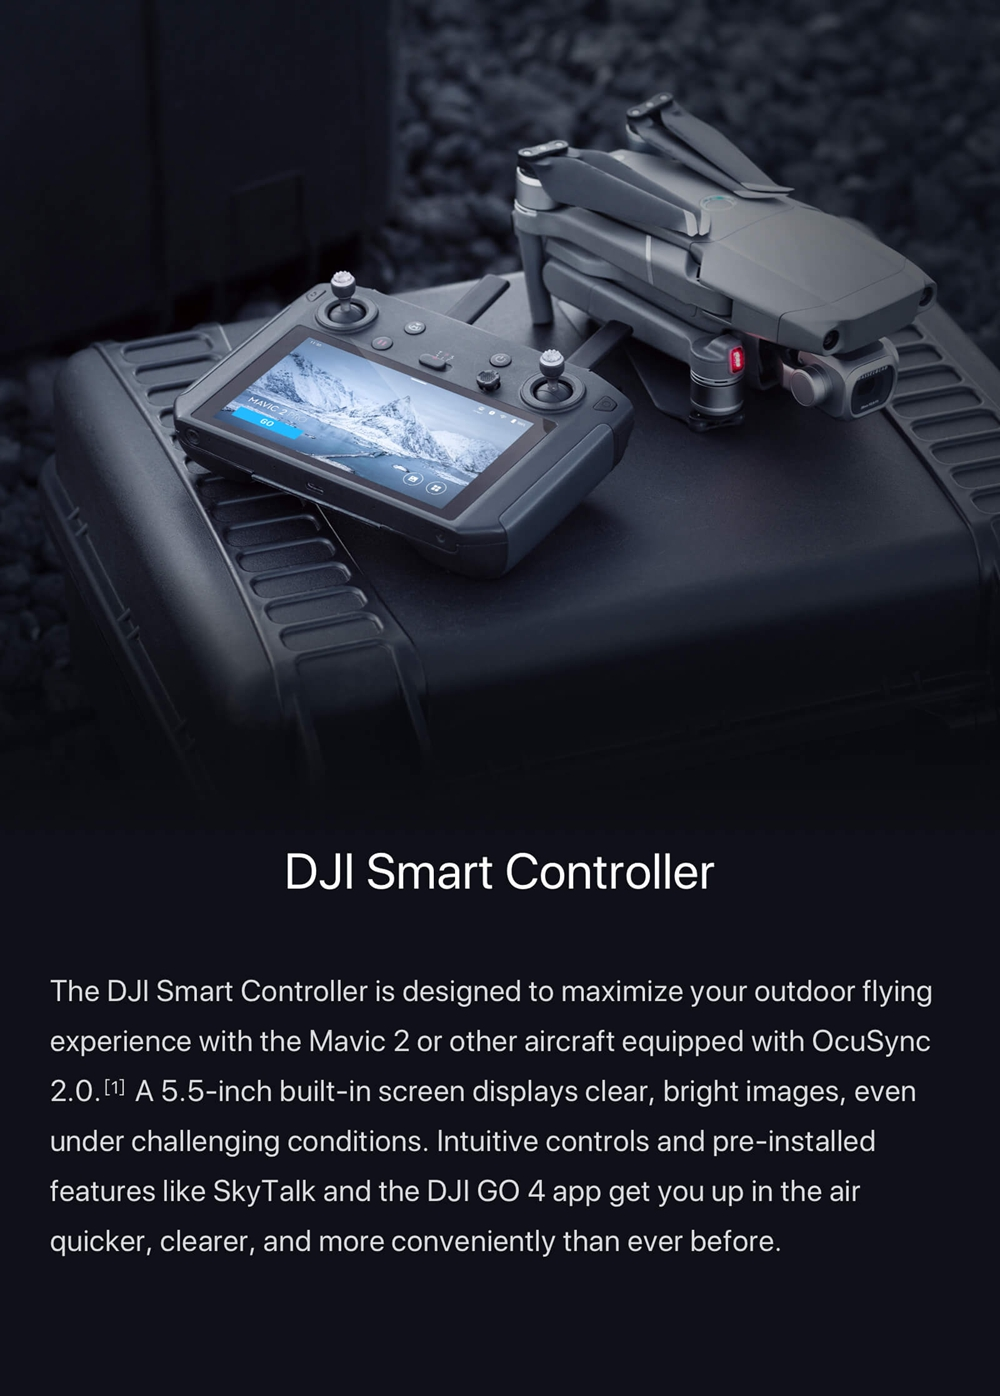 DJI Smart Controller Transmitter with 5.5-inch 1080P Screen OcuSync 2.0 Go Share SkyTalk for DJI Mavic 2 Series RC Drone